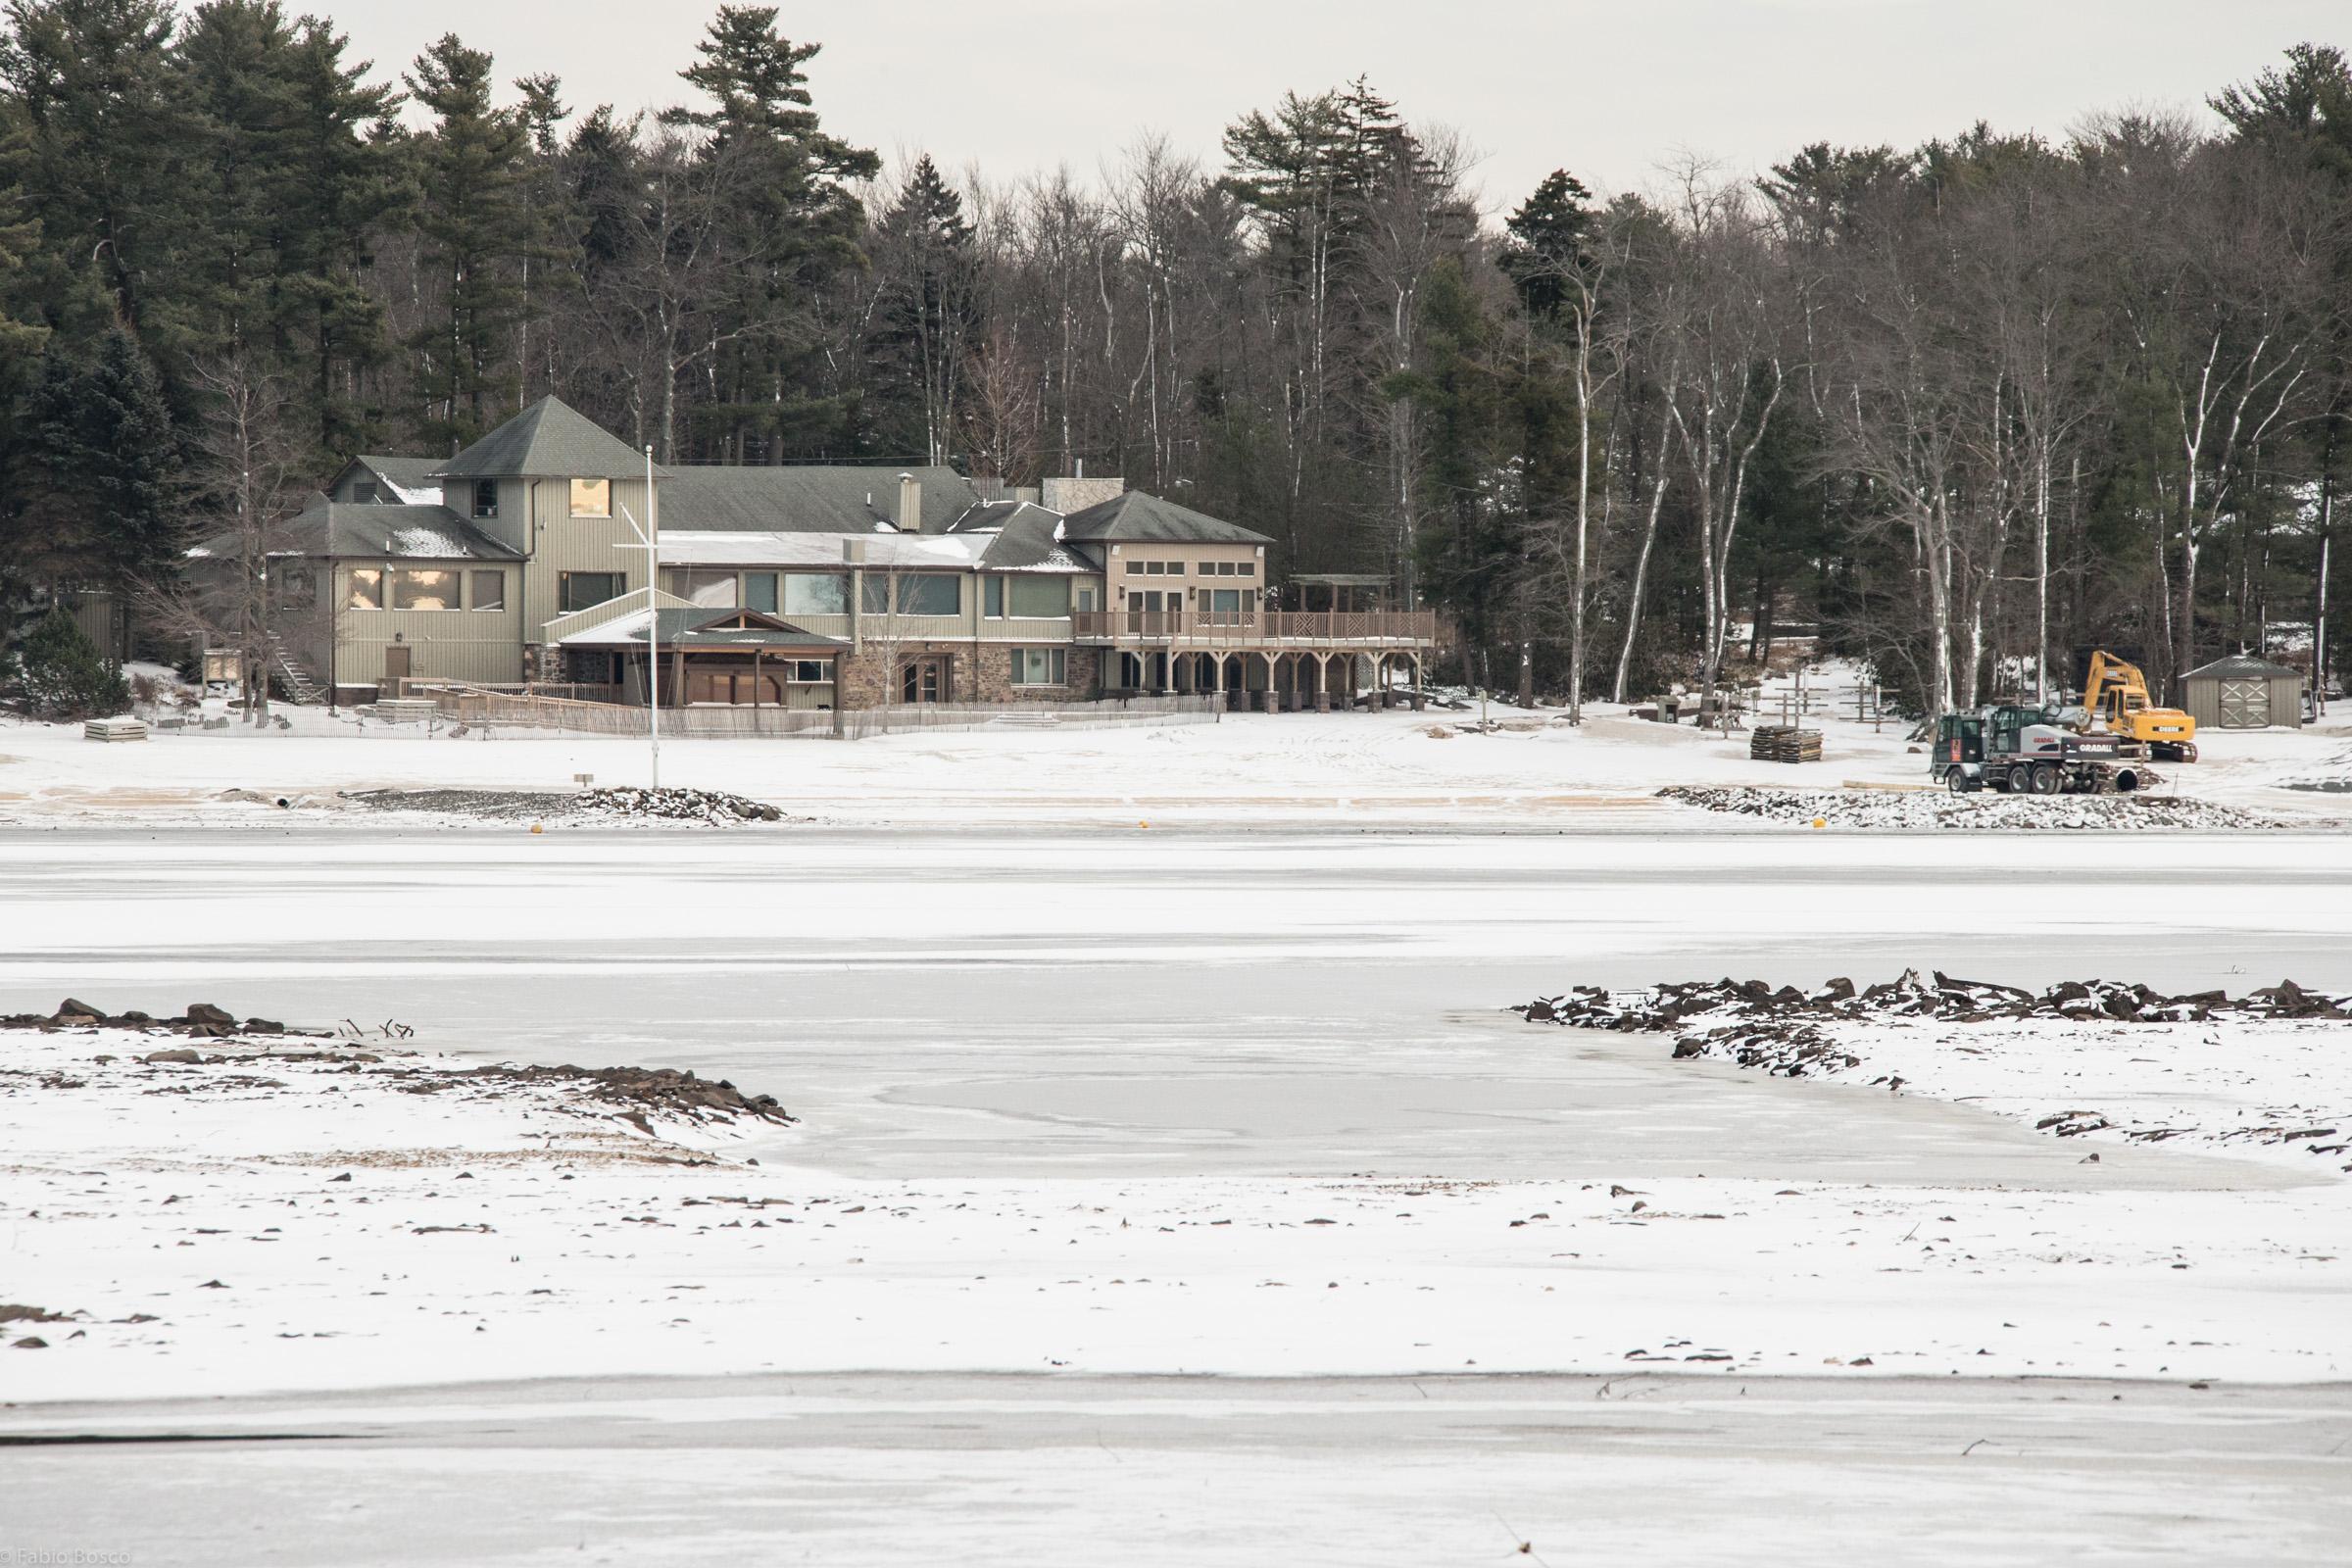 Lake Naomi: not like Summer